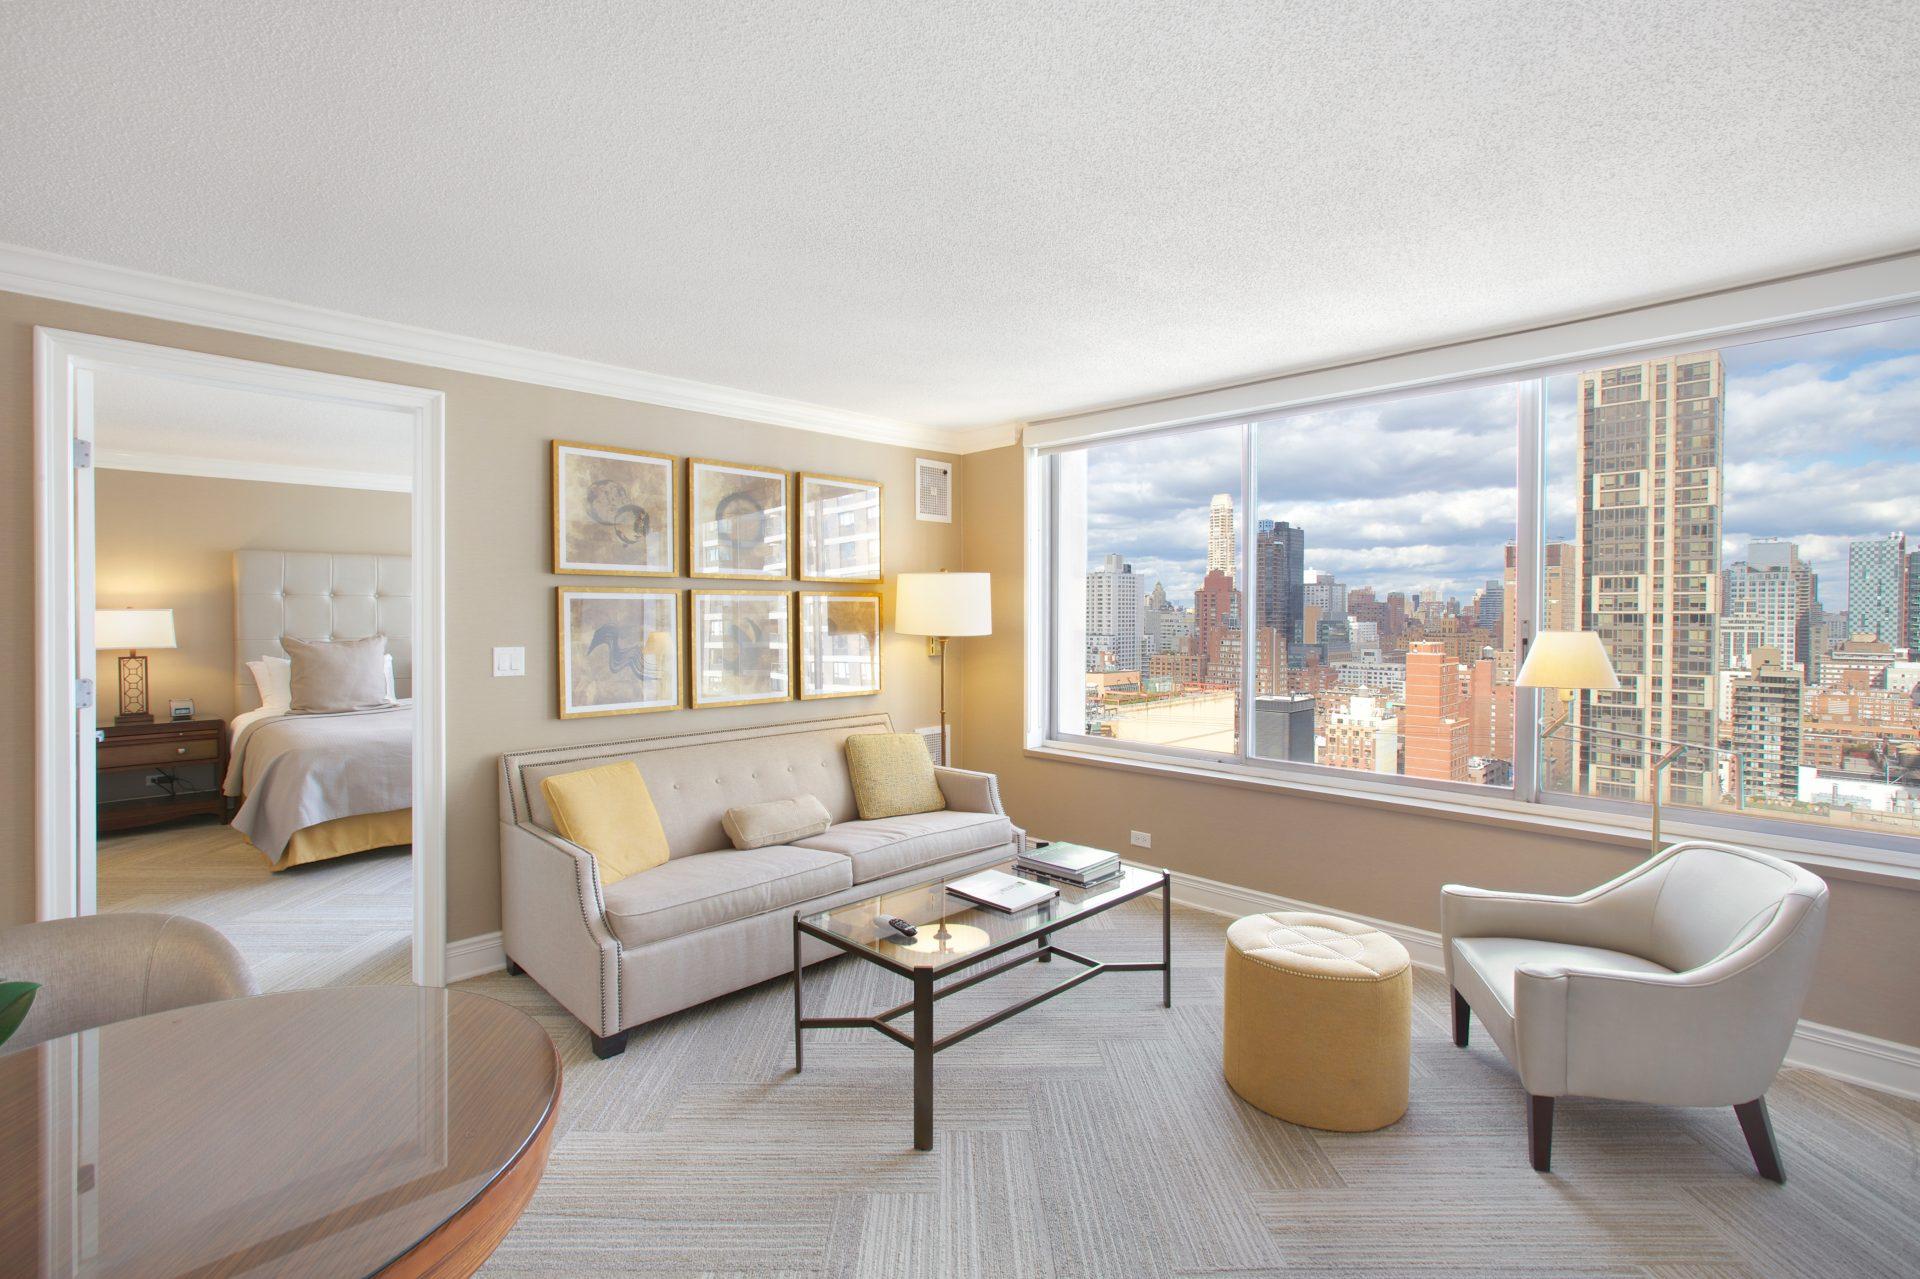 Client Properties - 2/3 - Suite Home Chicago